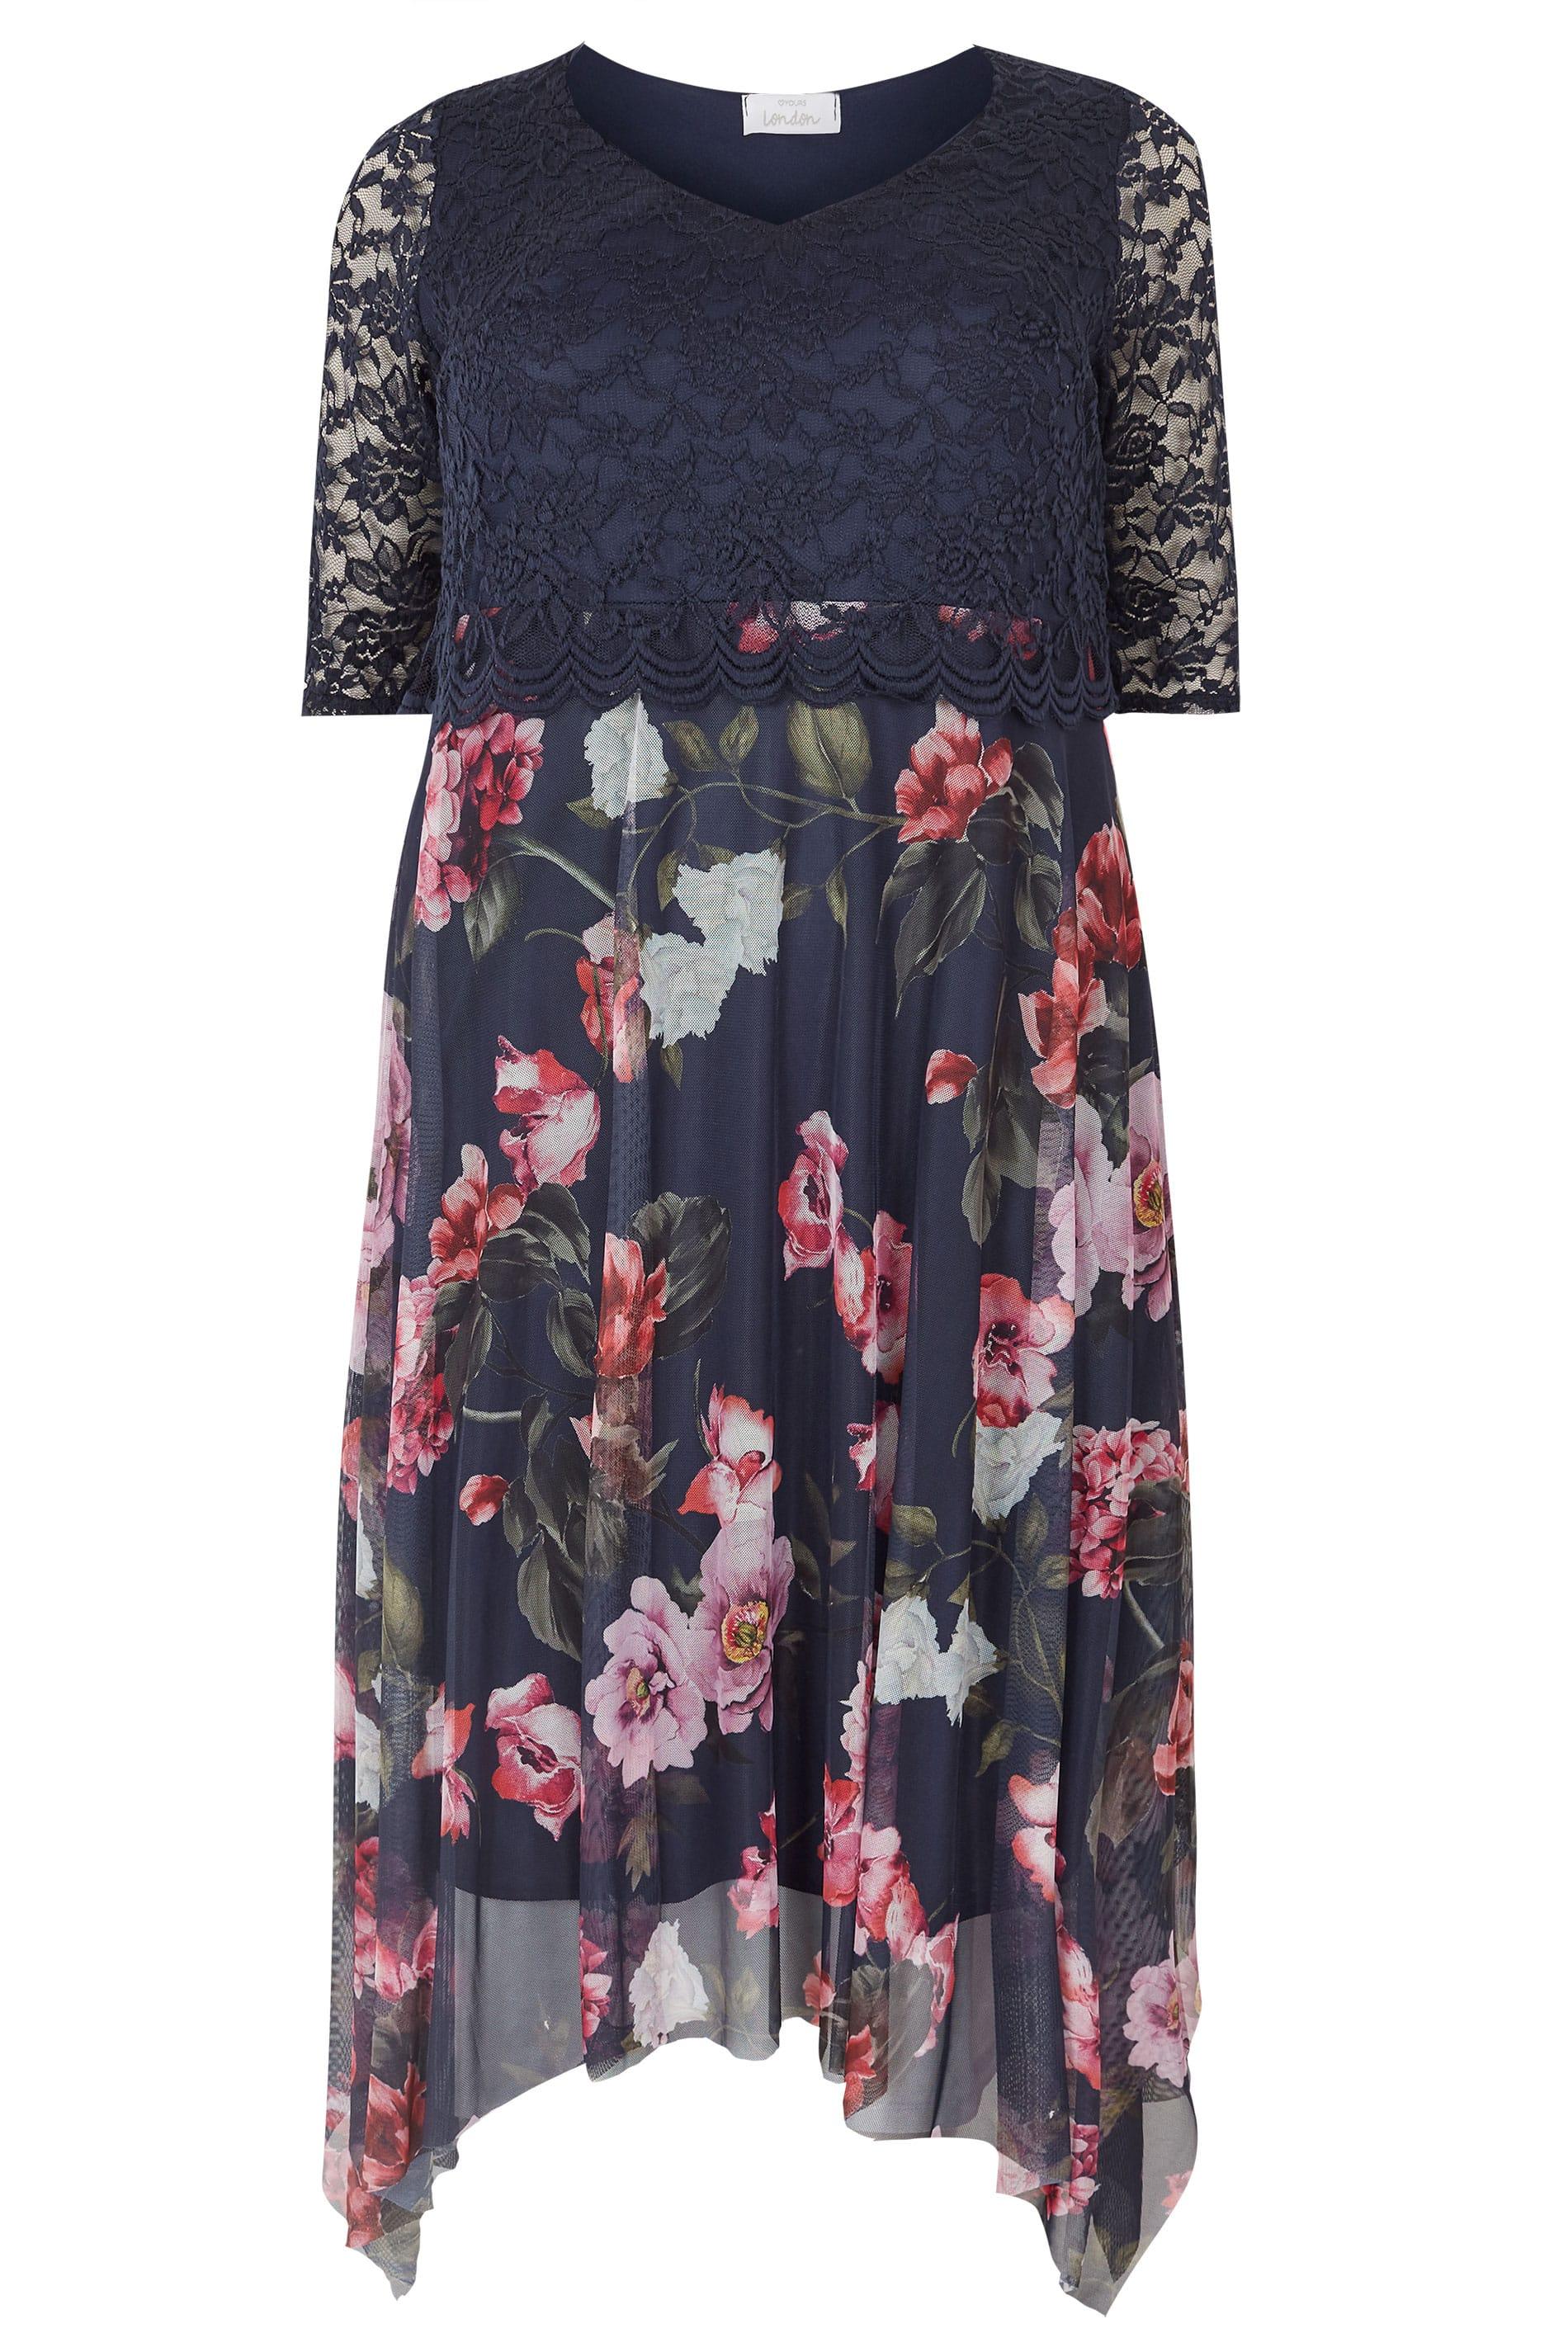 YOURS LONDON Navyblaues & Pinkes Kleid mit Blumenprint ...